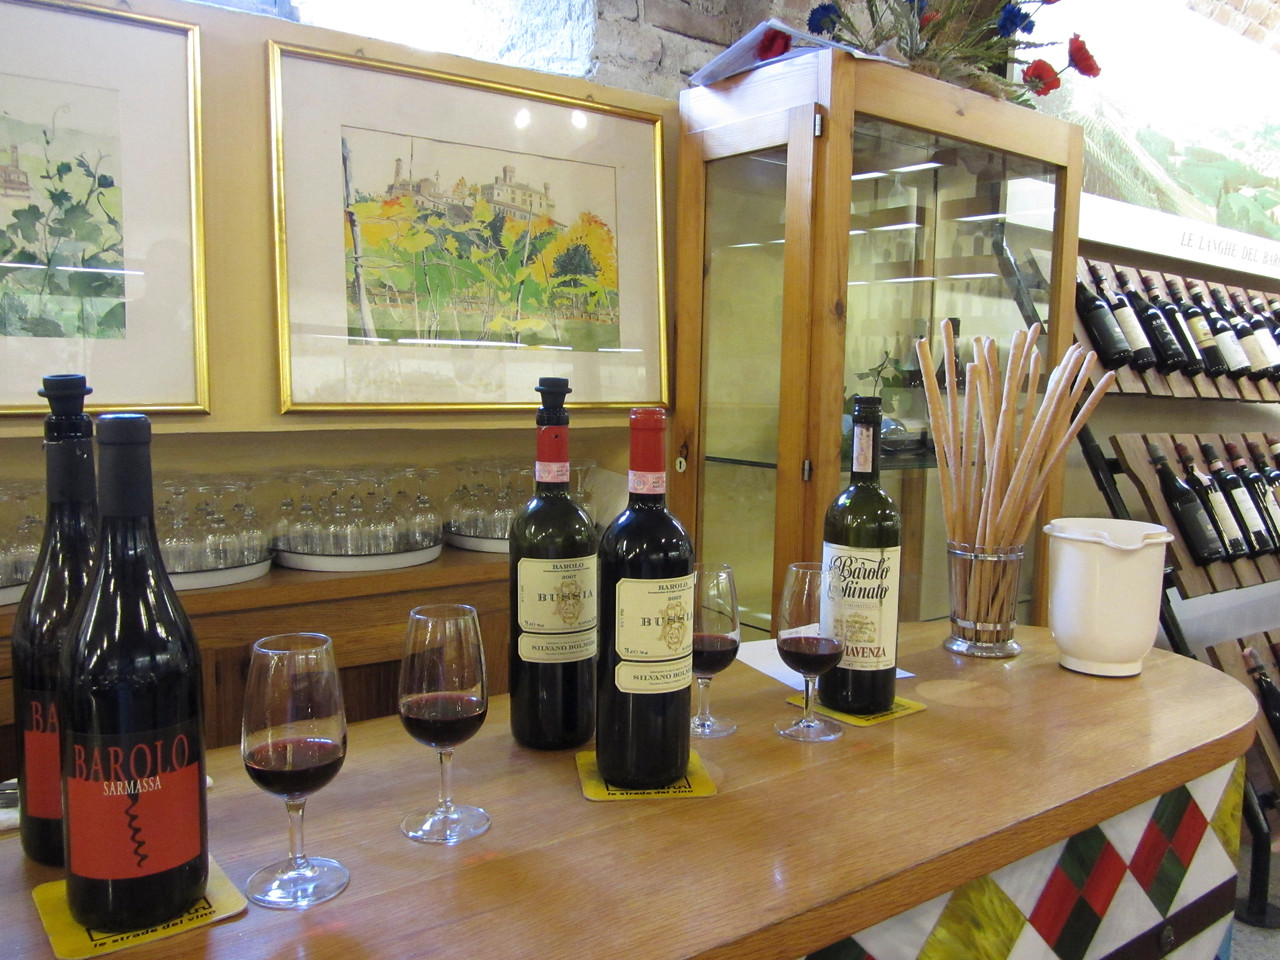 tasting Barolo at the Enoteca Regionale del Barolo